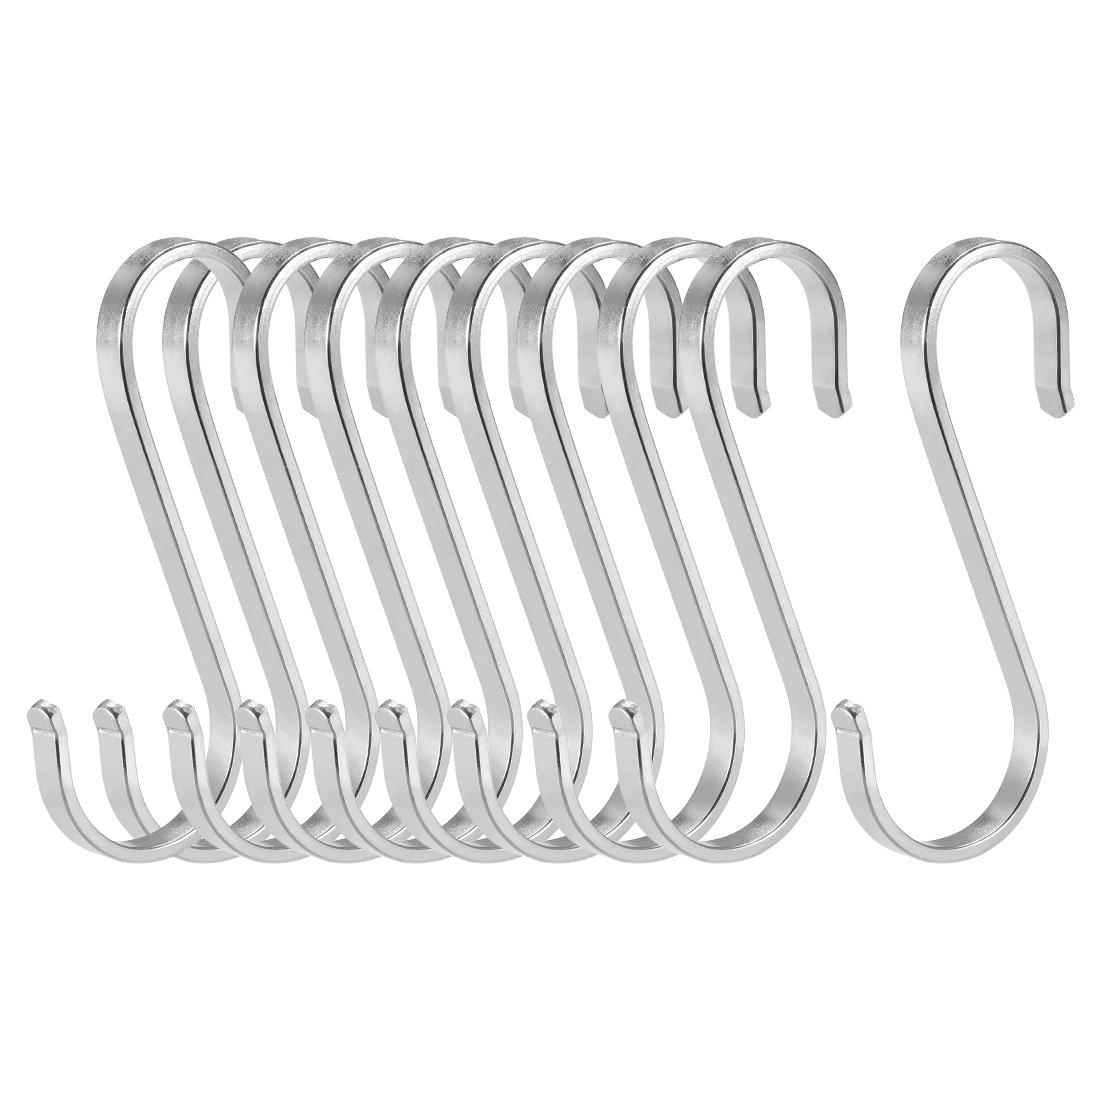 "Stainless Steel S Hooks 3.15"" S Shaped Hook Hangers Multiple Uses 10pcs"